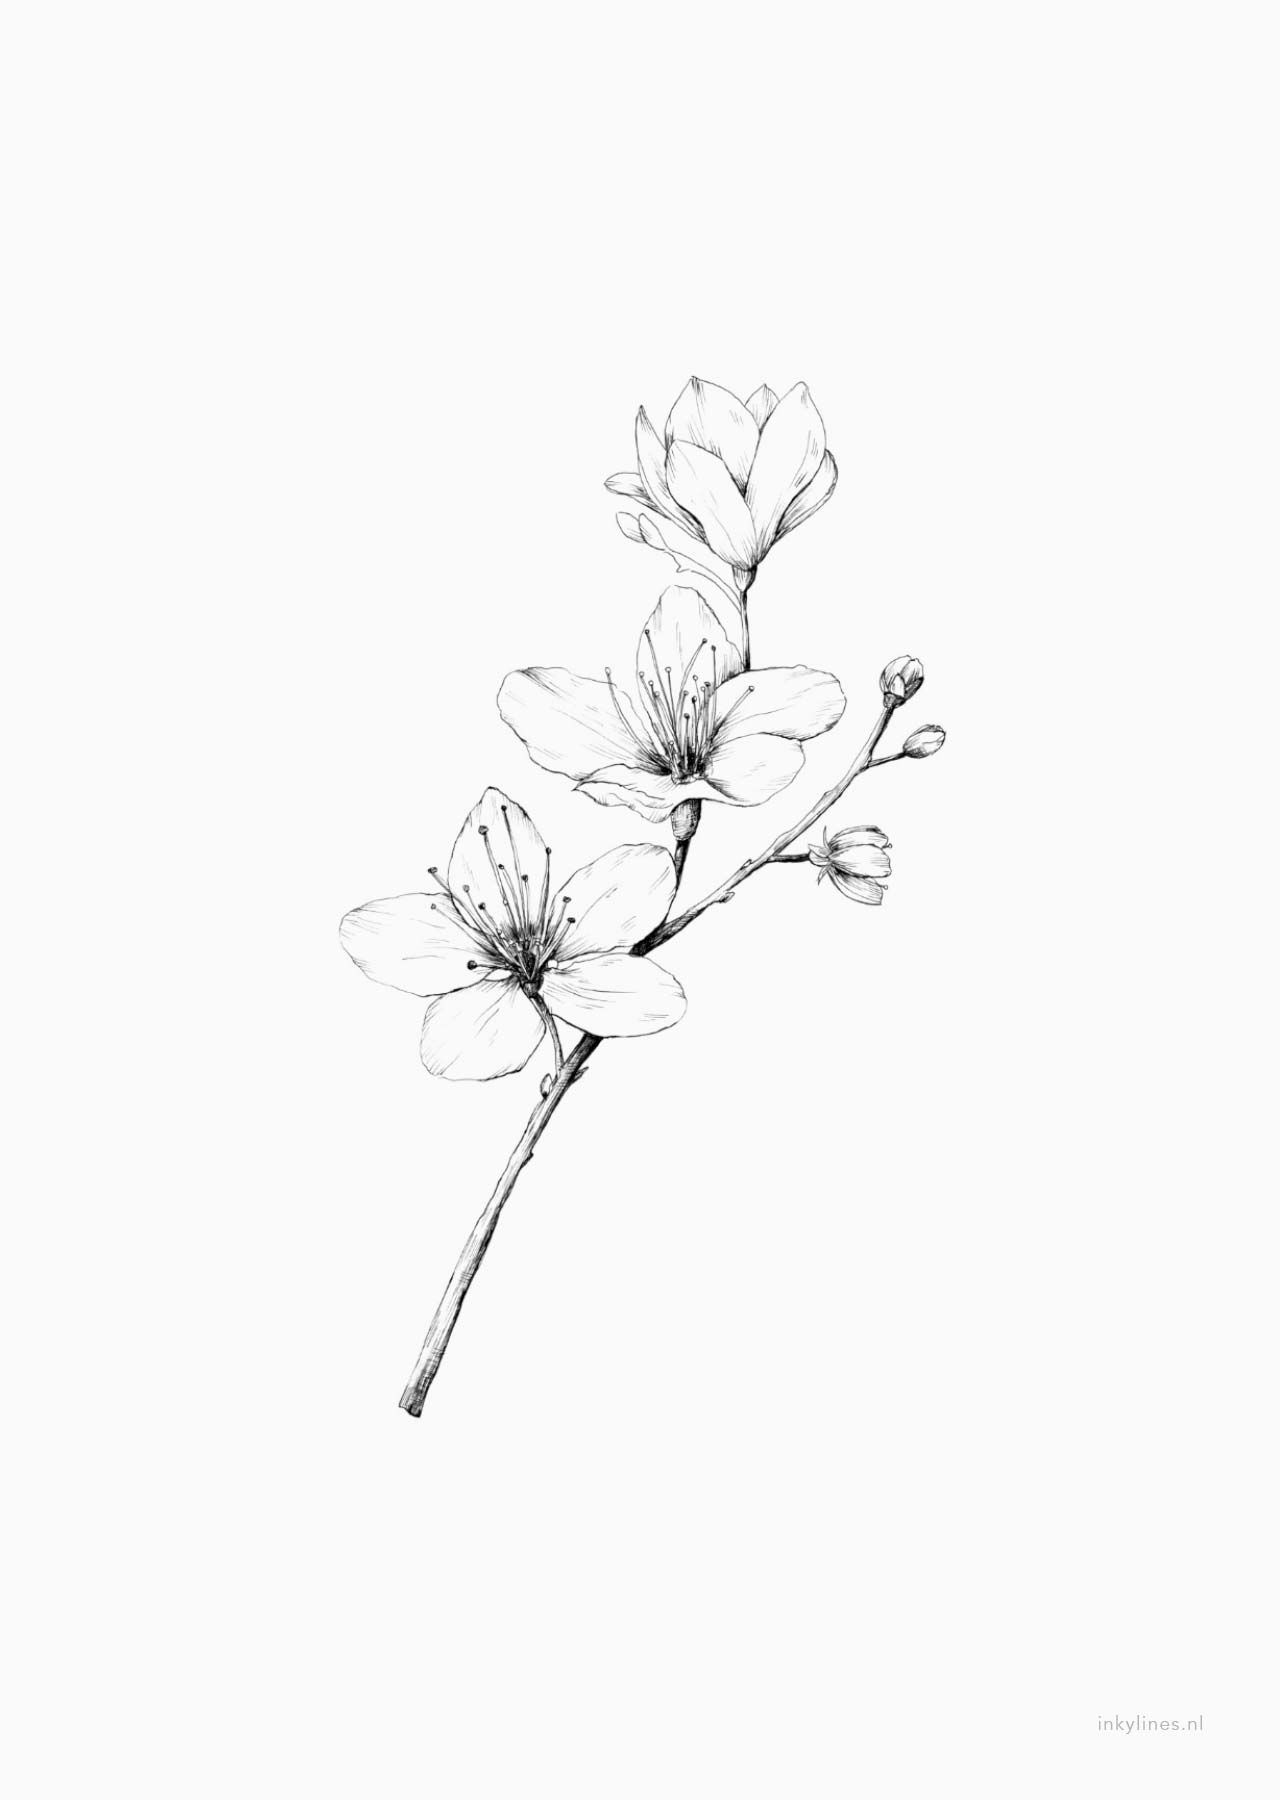 Inkylines Flowers Cherry Blossom In 2020 Cherry Blossom Drawing Simple Flower Tattoo Blossom Tattoo